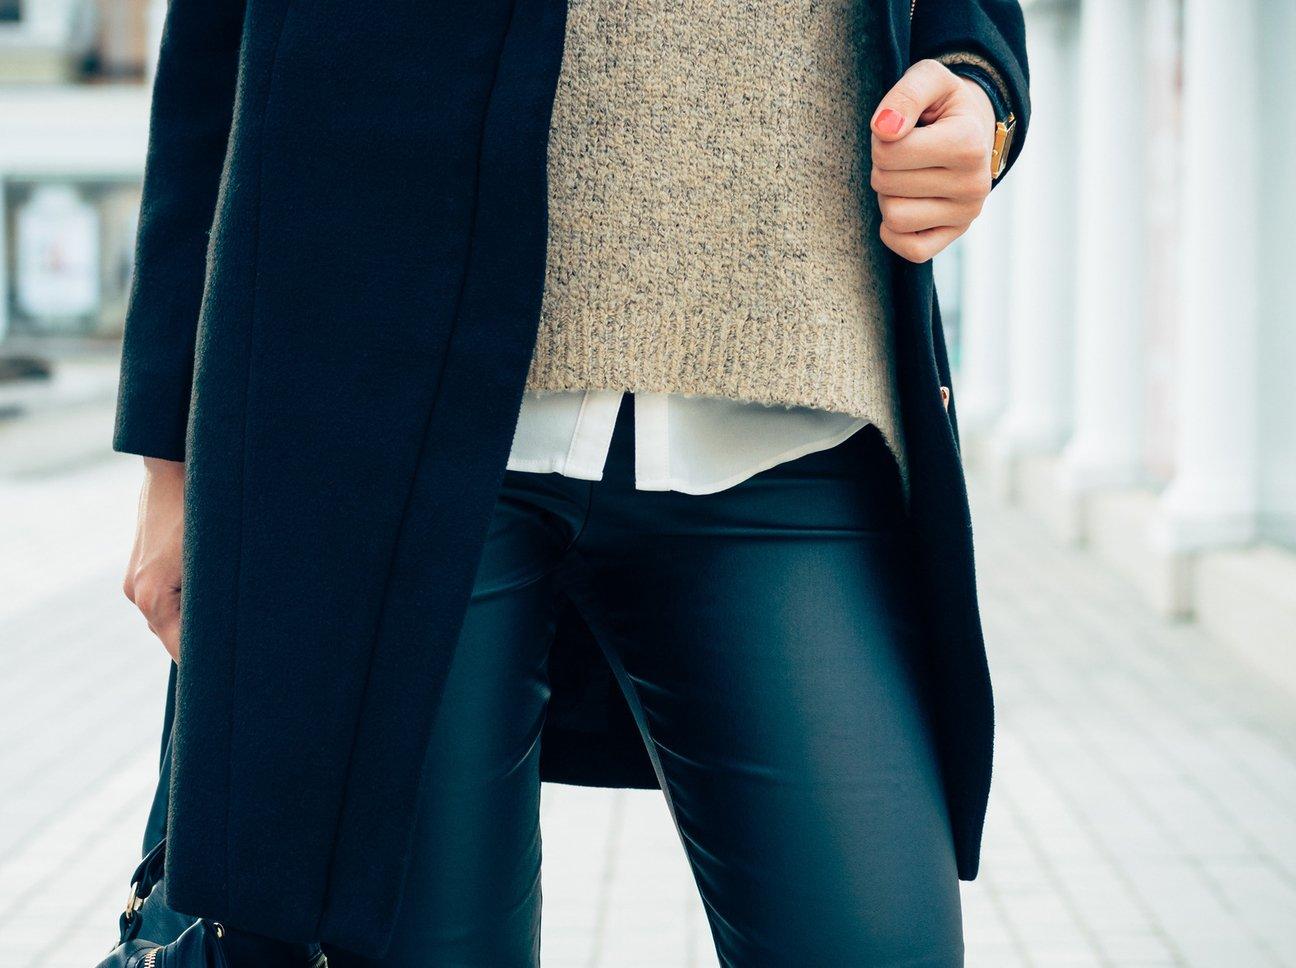 Jeggings tragen statt Jeans origineller Look